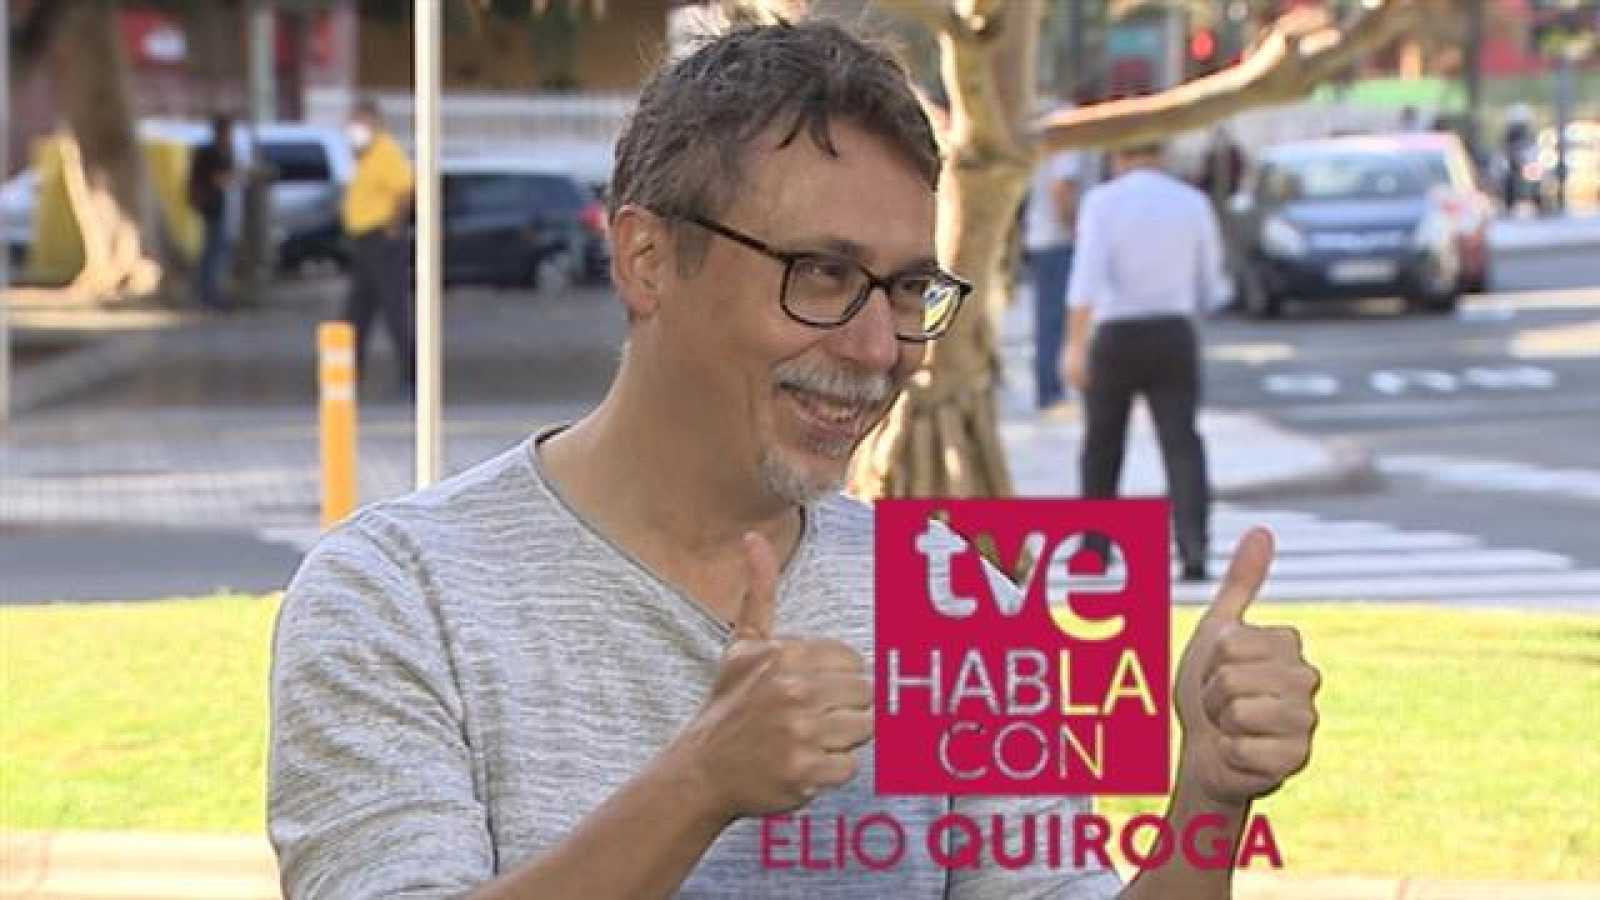 TVE habla con Elio Quiroga - 18/04/2021